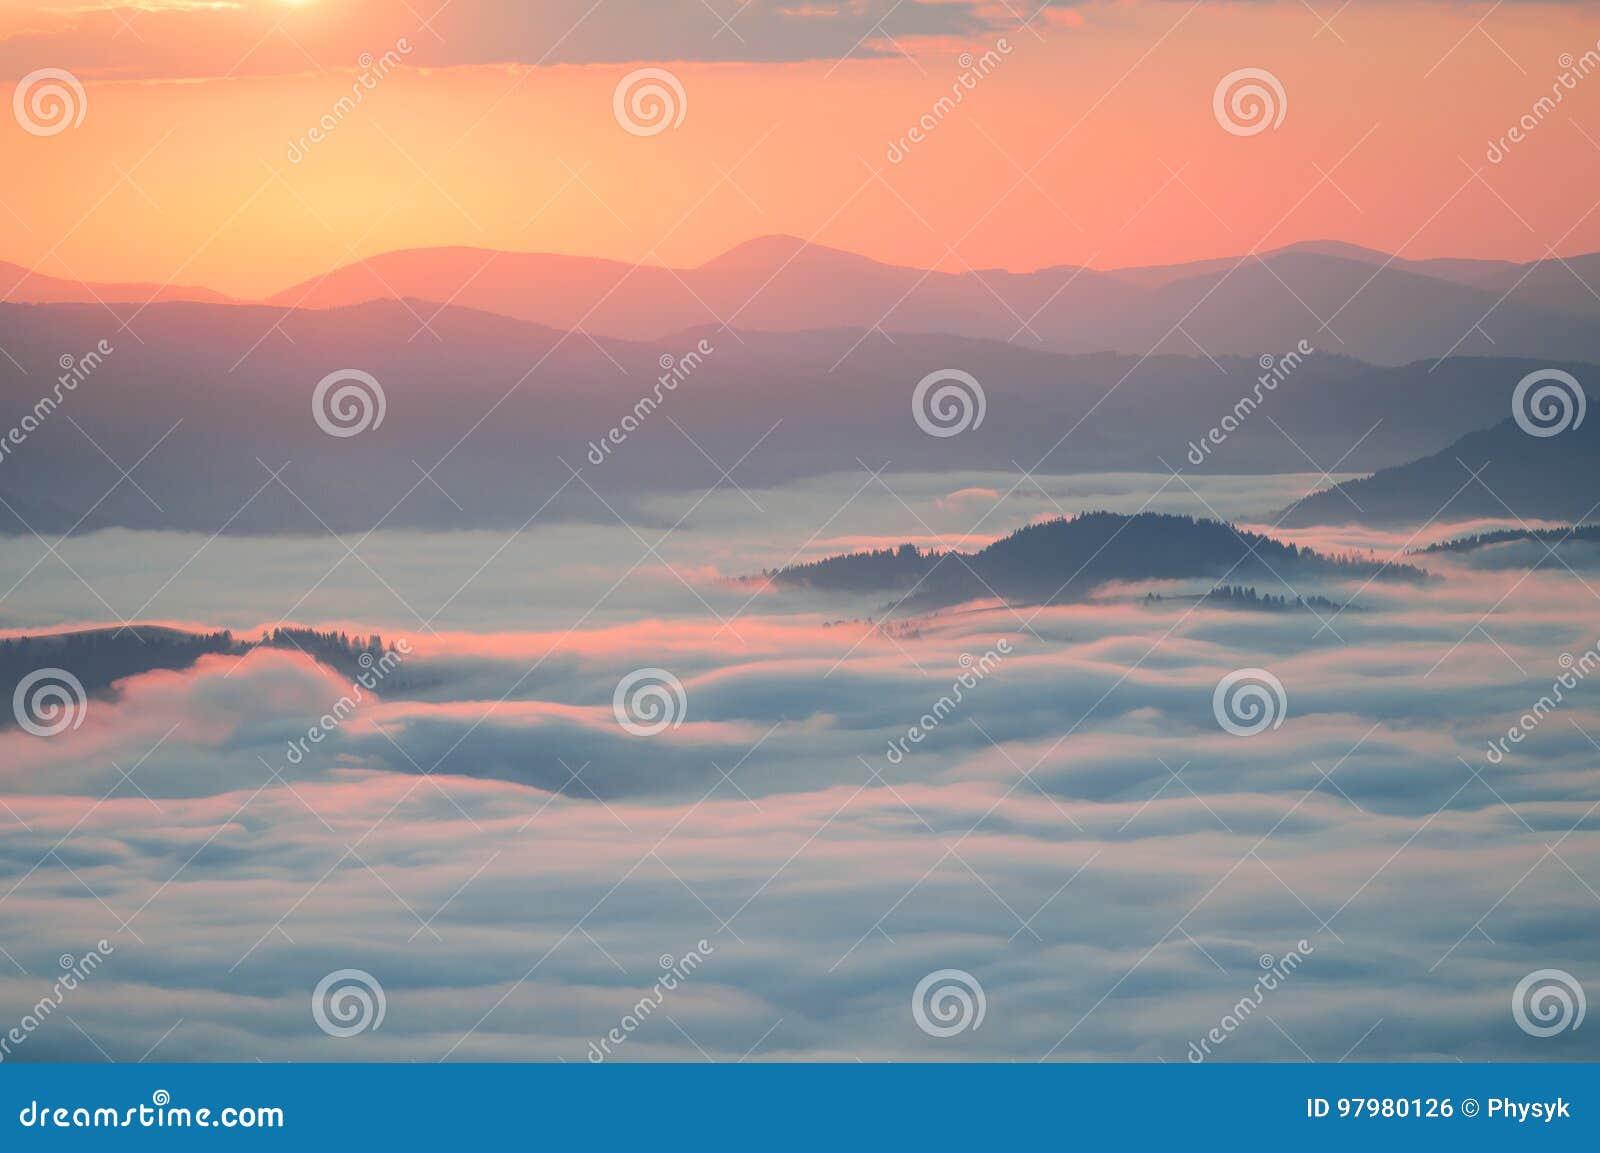 Sea of clouds in mountain at sunrise. Carpathians, the ridge Borzhava, Ukraine.